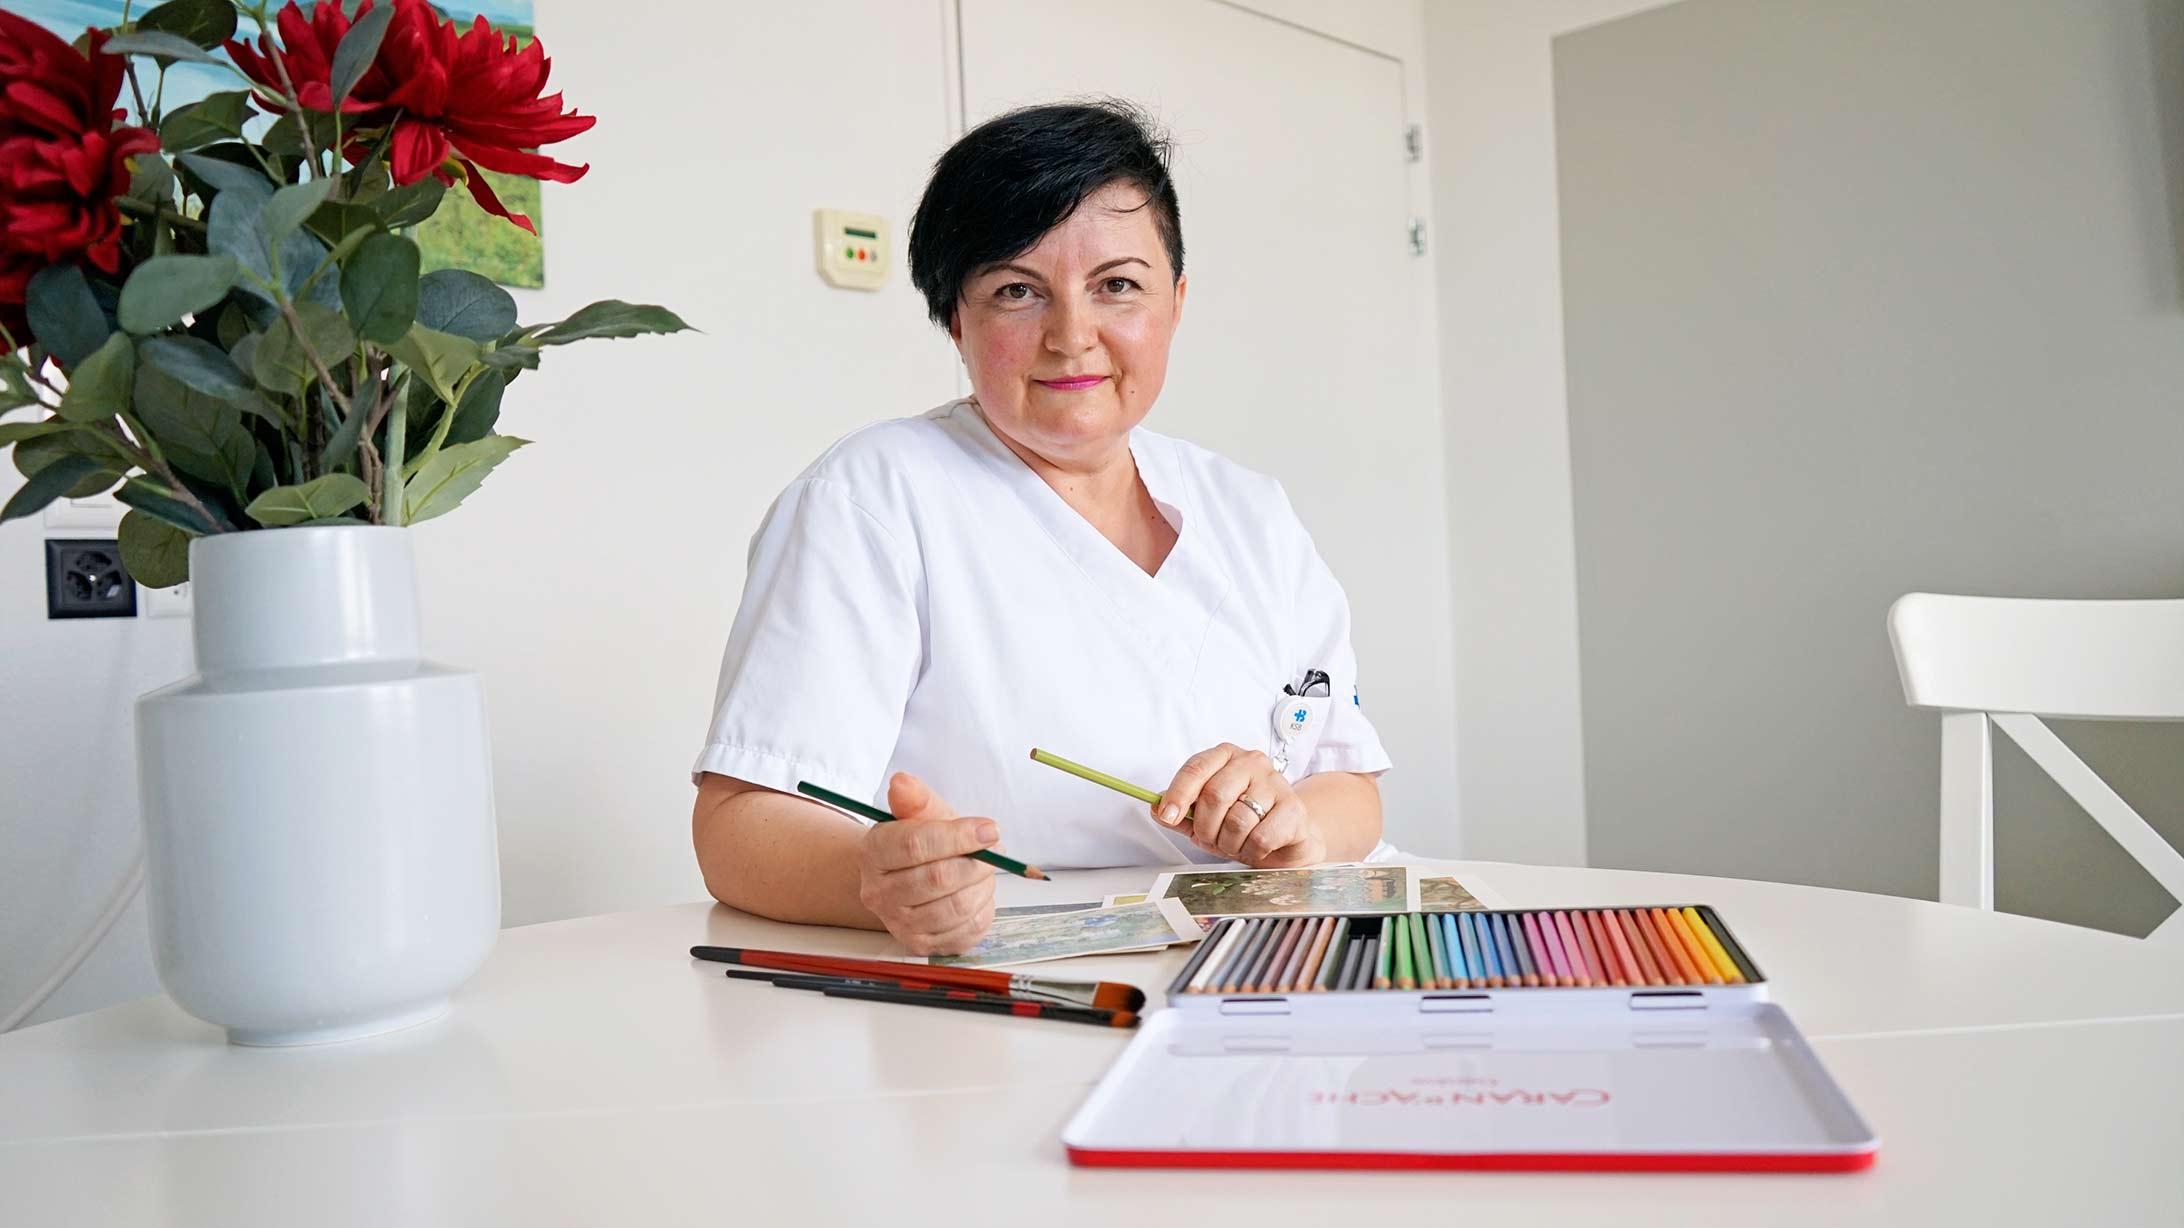 Kunsttherapeutin Jasmina Filati Kinkela